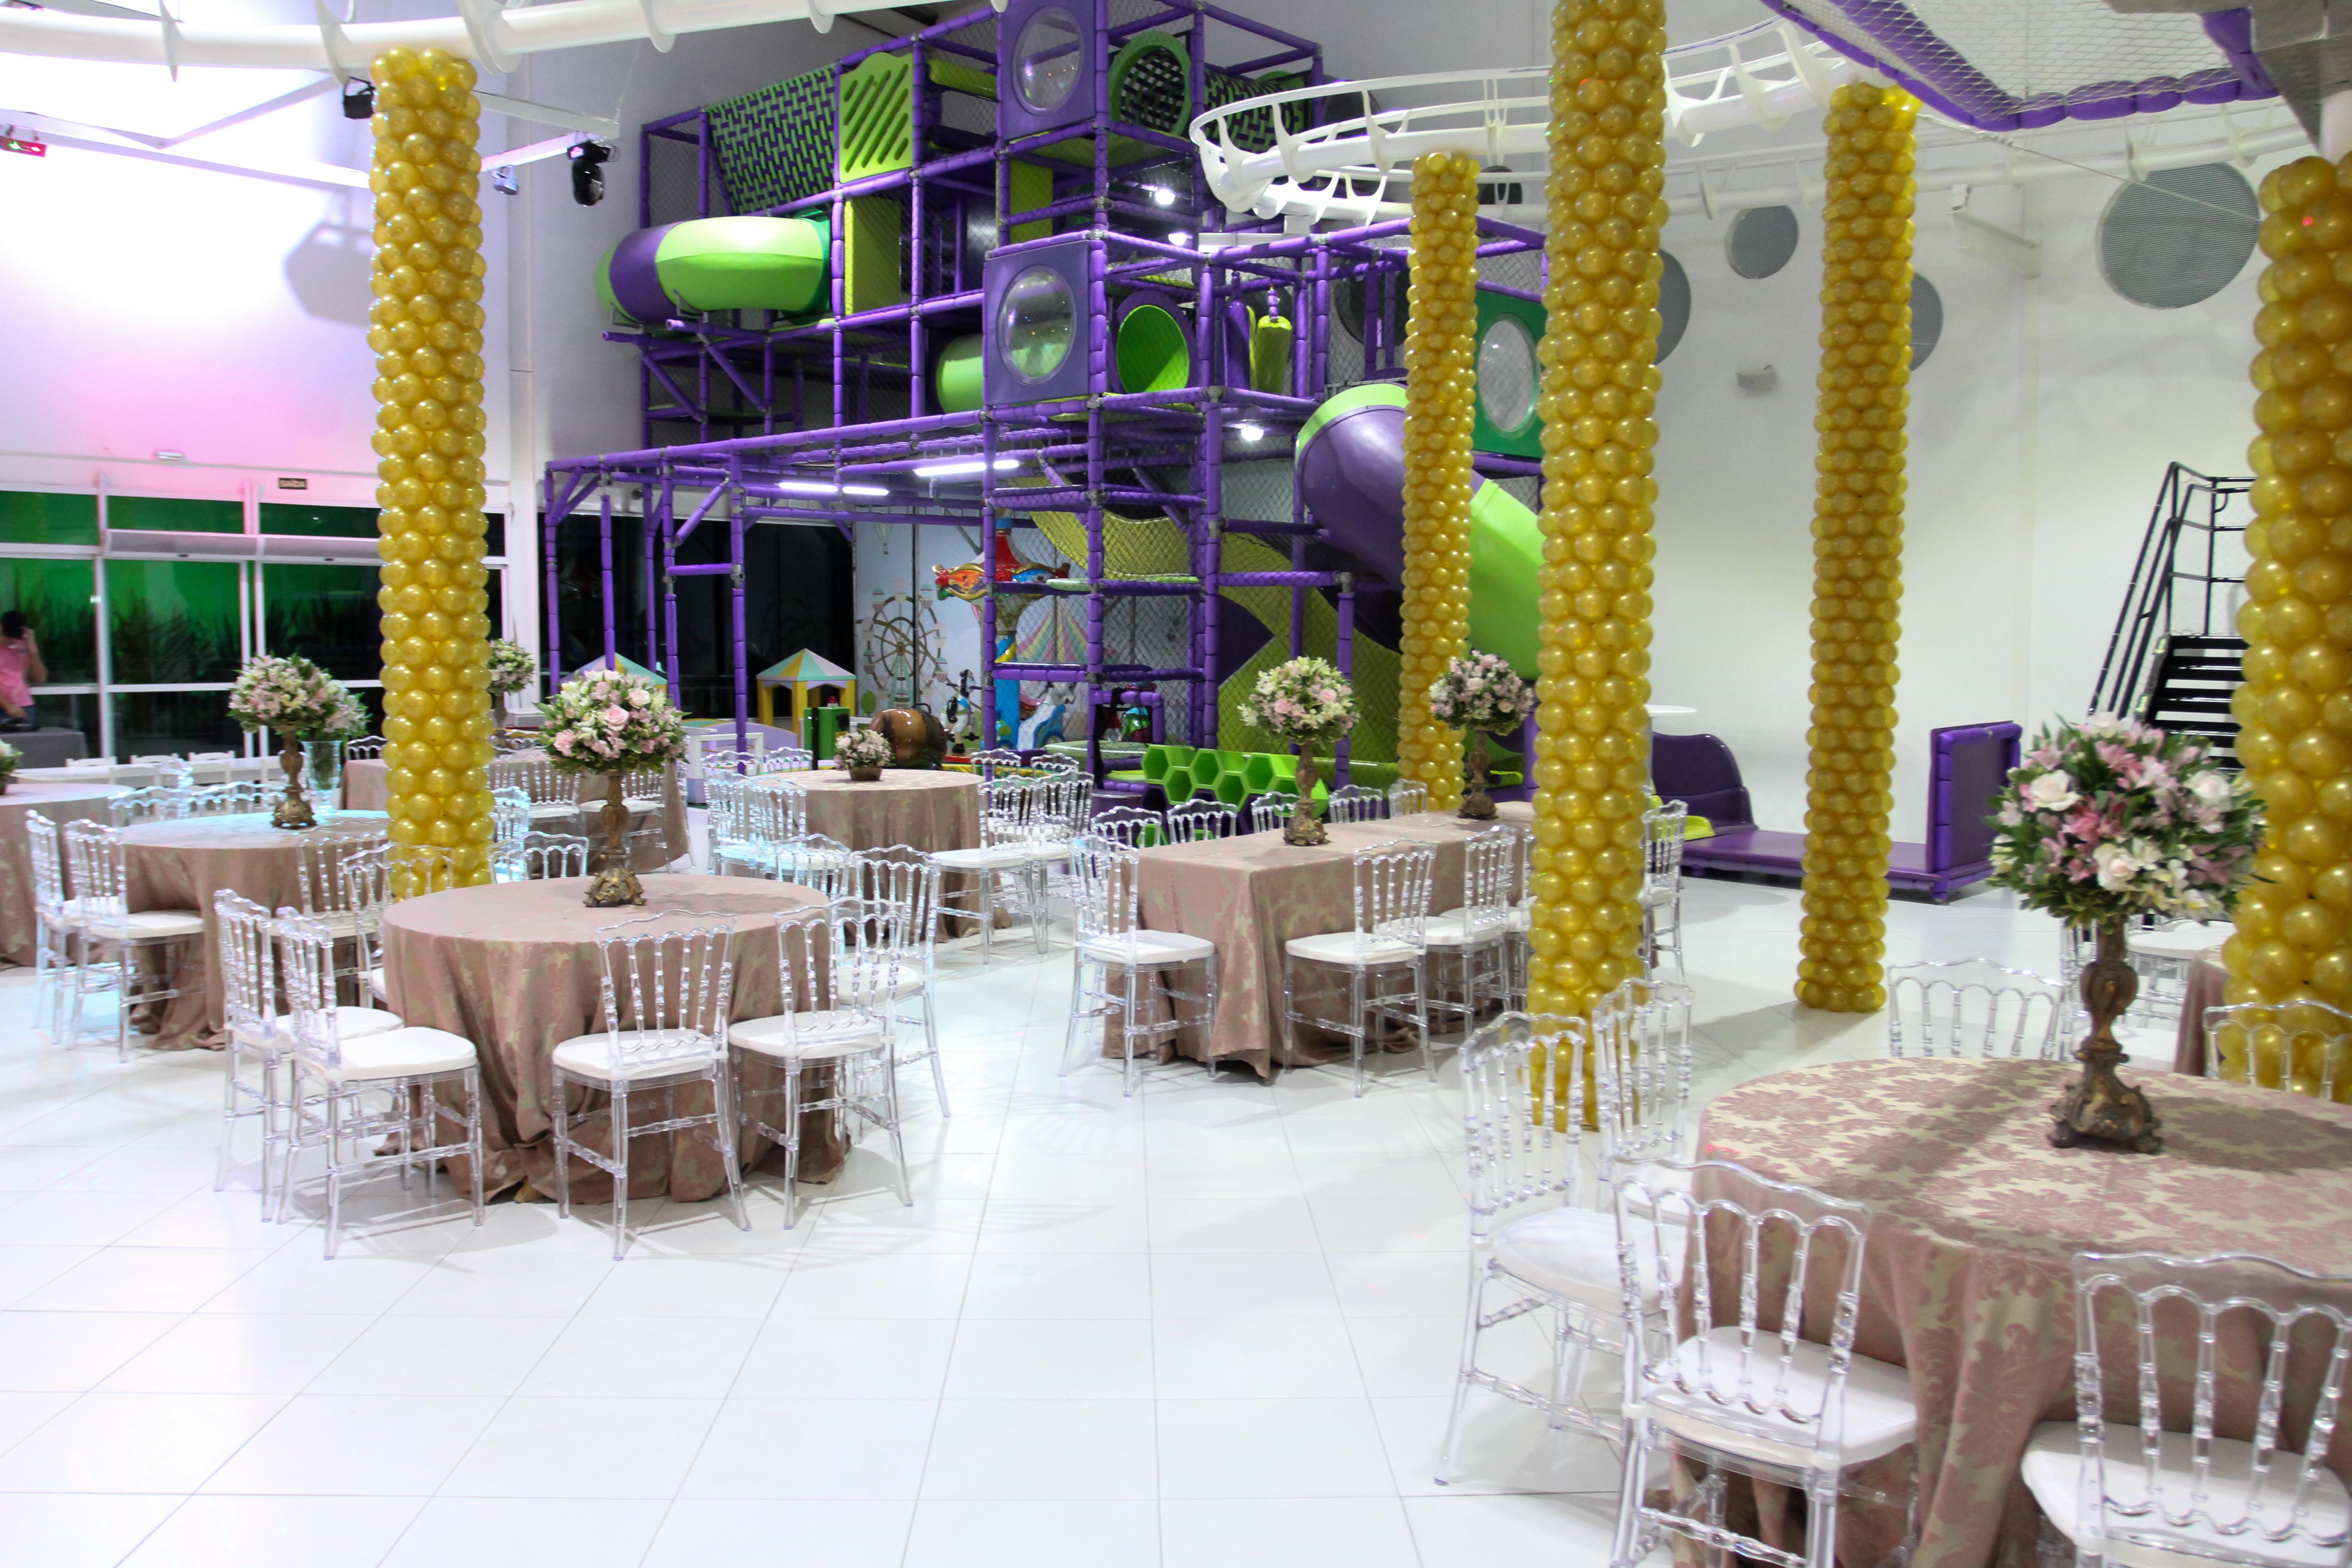 Marvelous The Falls Buffet Infantil Campinas Download Free Architecture Designs Intelgarnamadebymaigaardcom